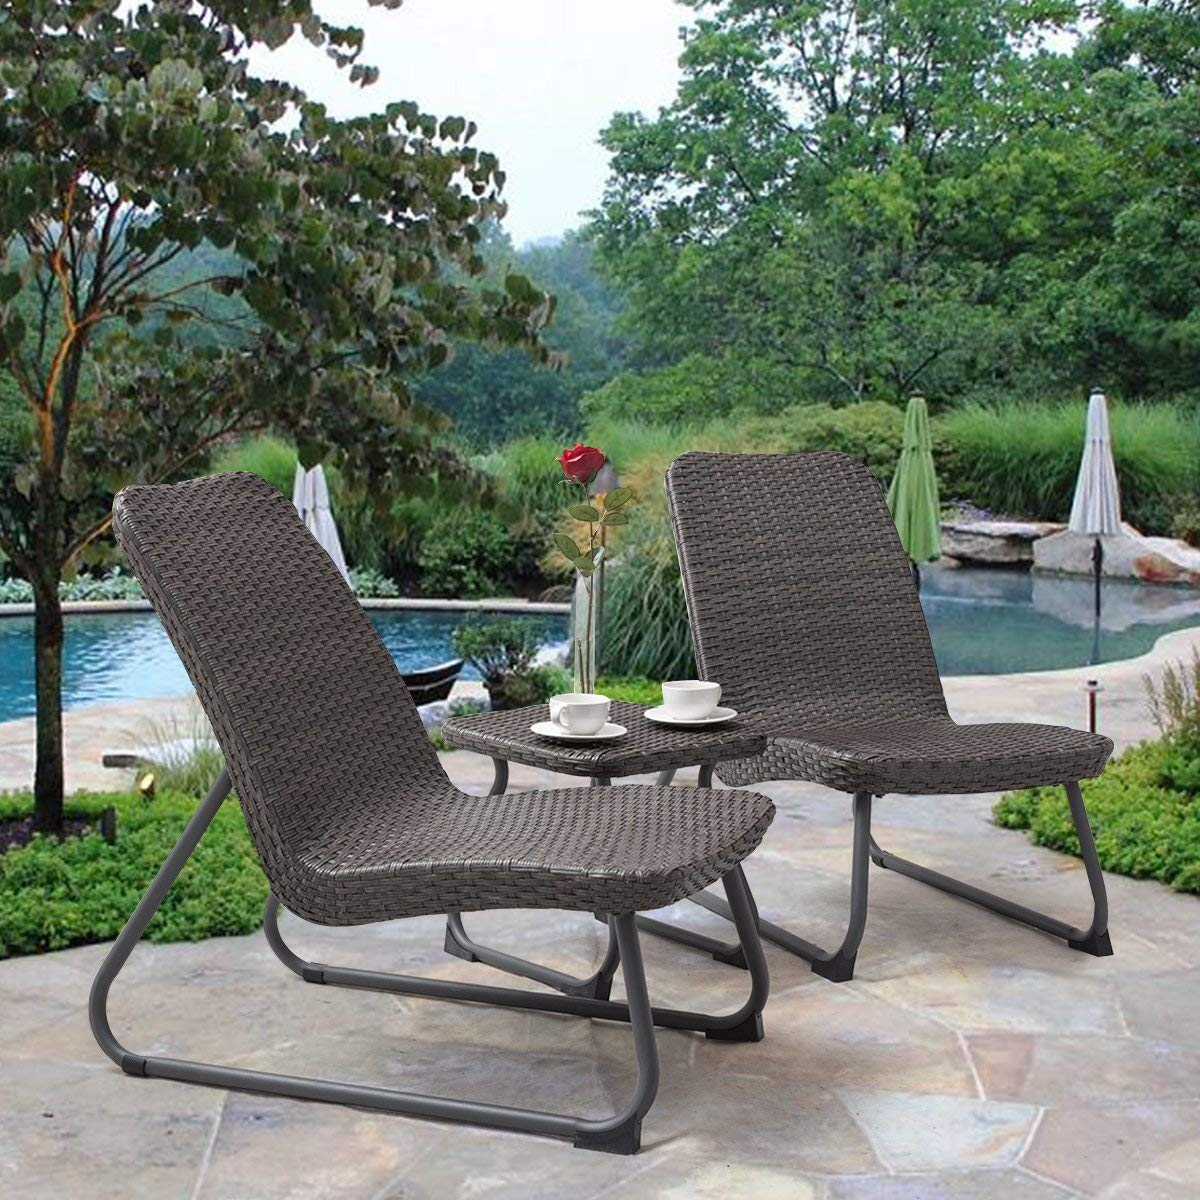 Amazon com tangkula patio furniture set 3 piece all weather outdoor garden wicker chair table set grey brown garden outdoor